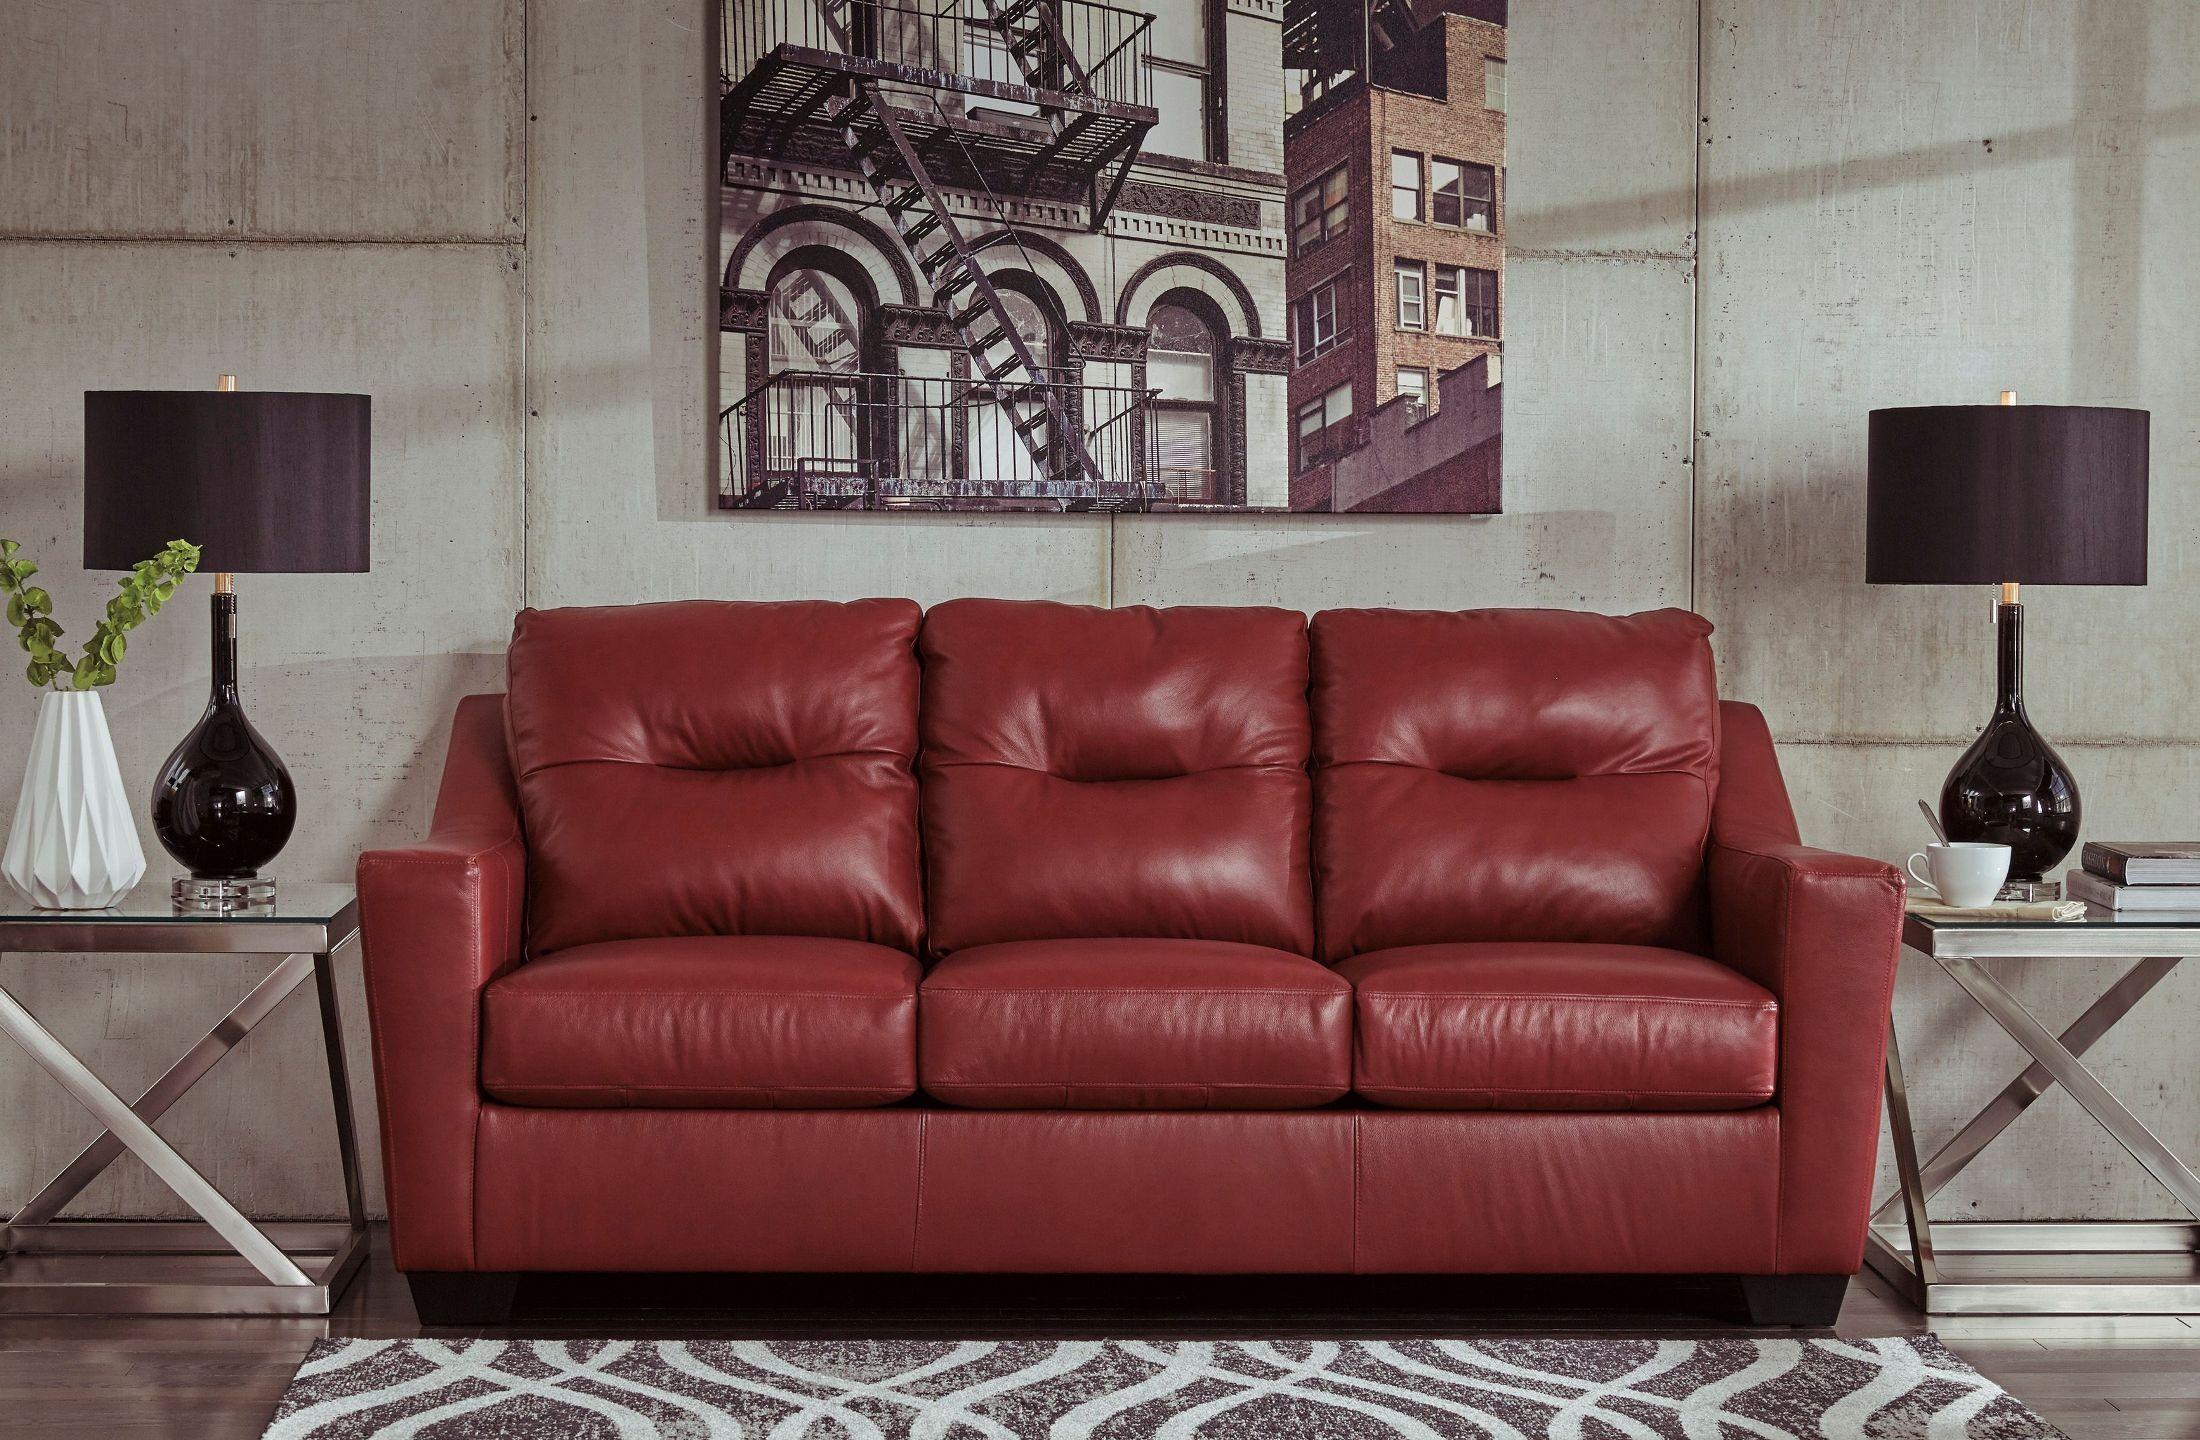 Kensbridge Crimson Sofa From Ashley Coleman Furniture